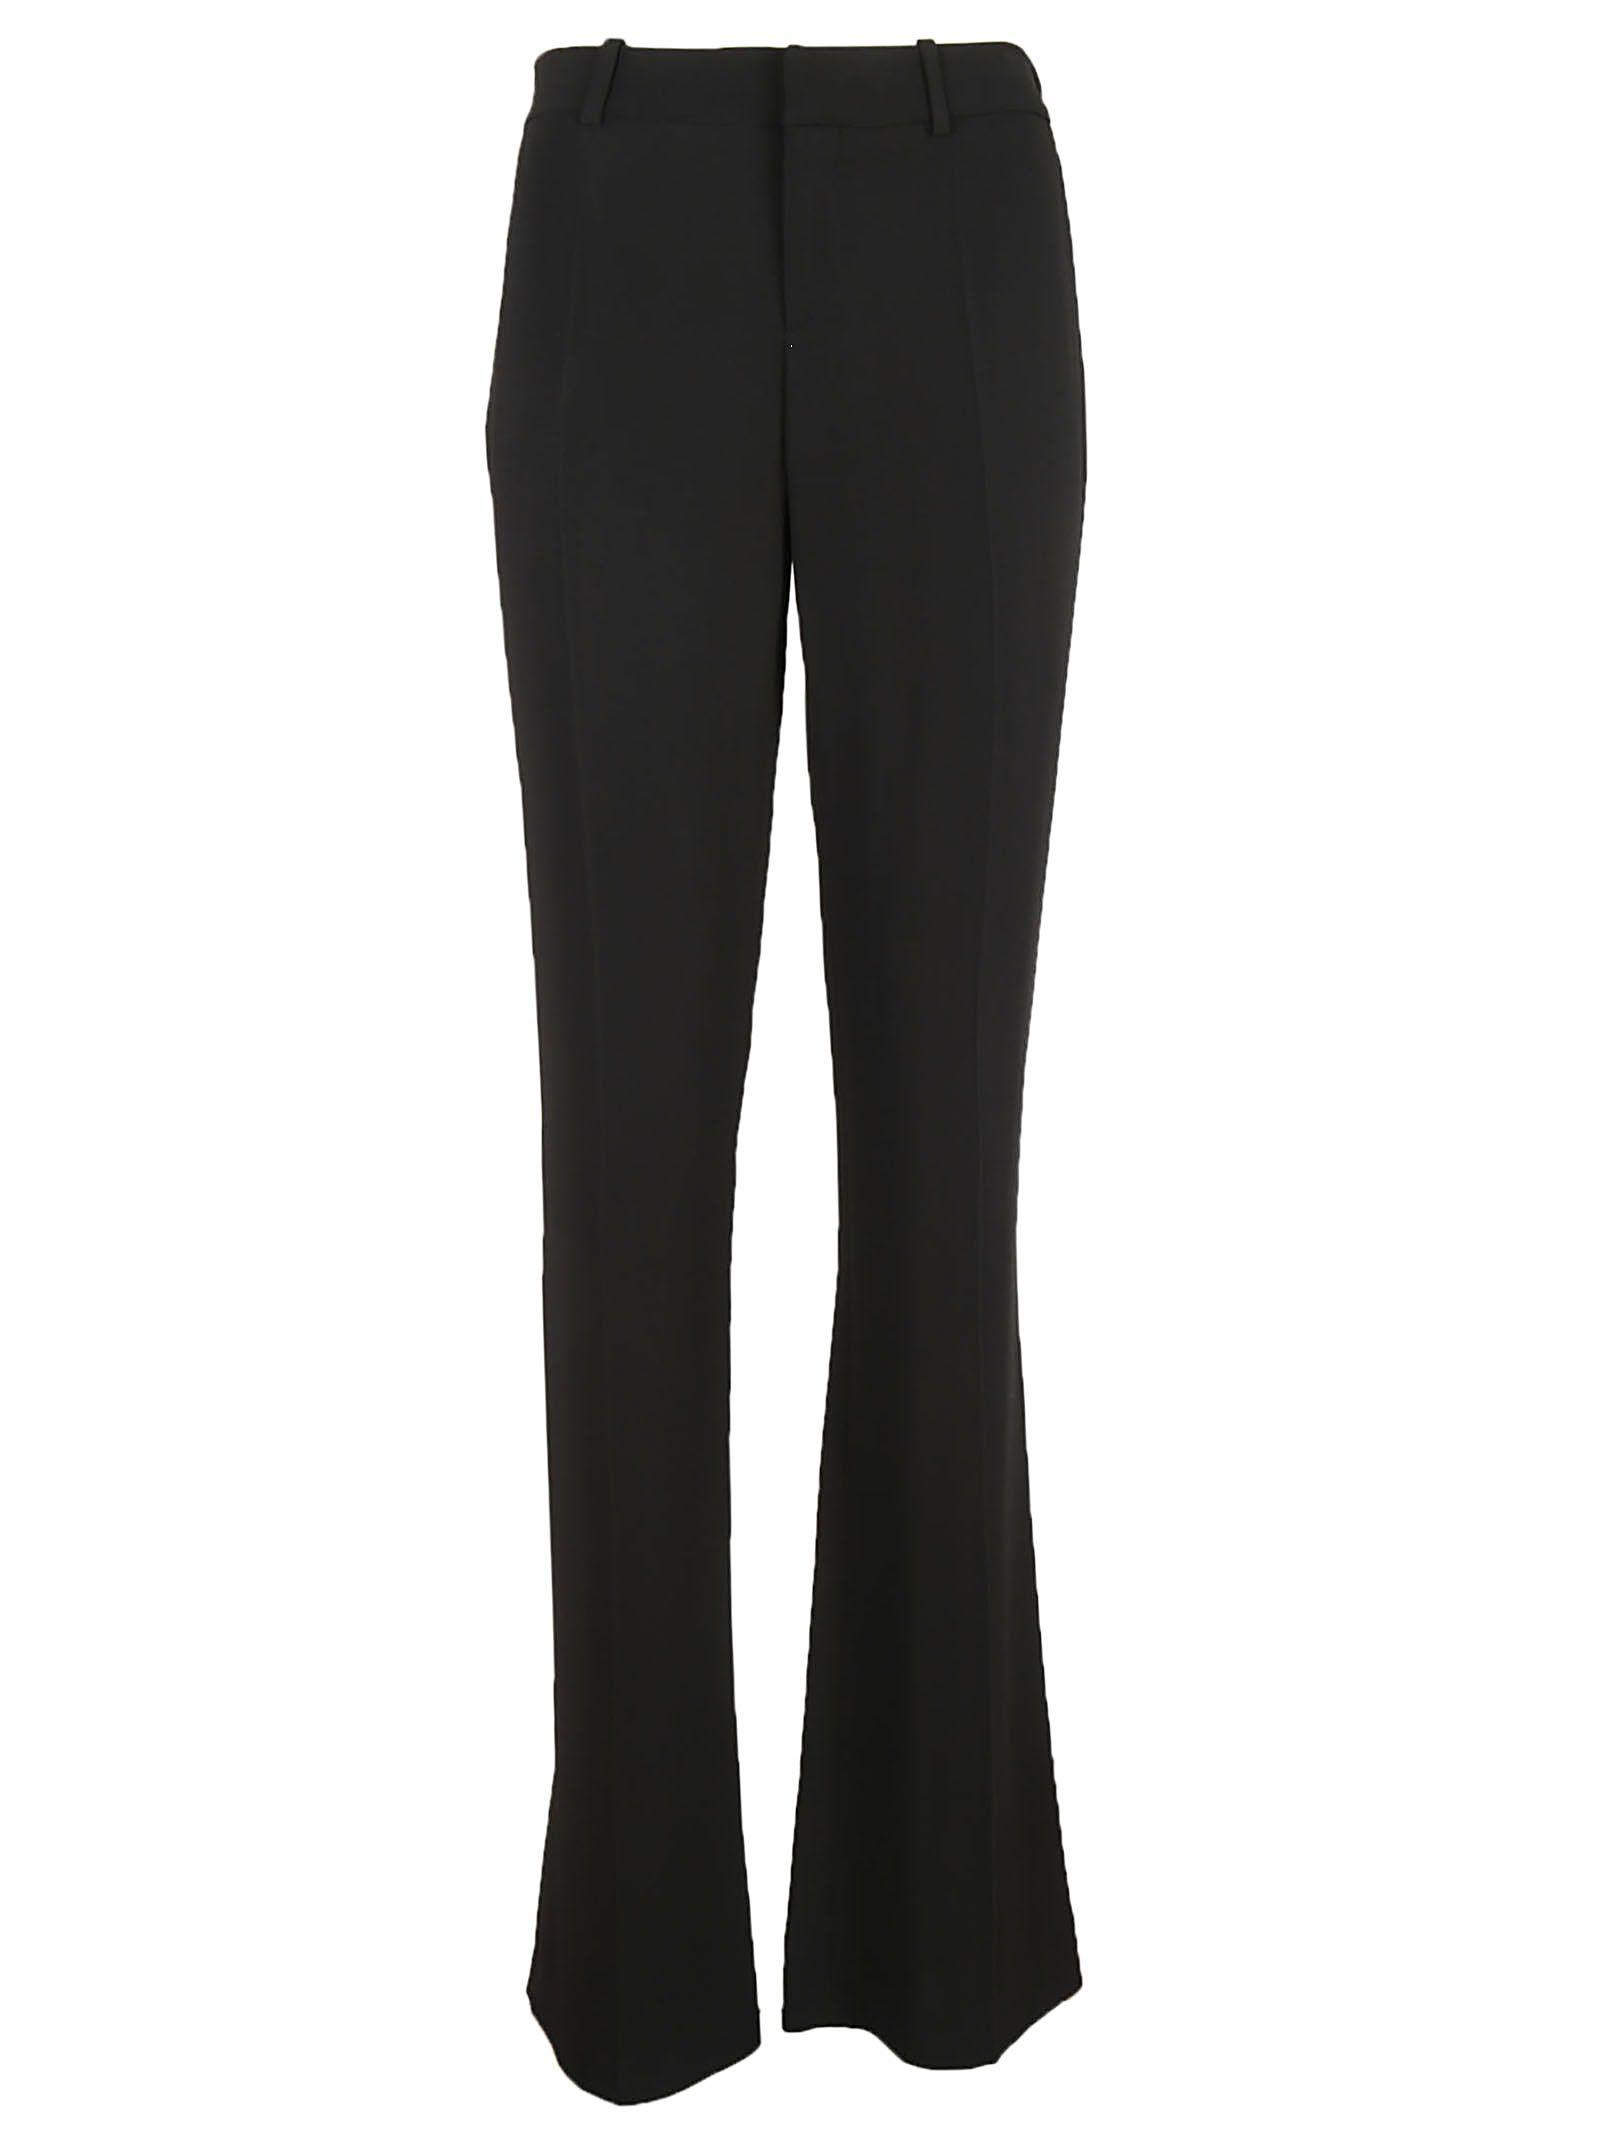 Givenchy Zampa Trousers